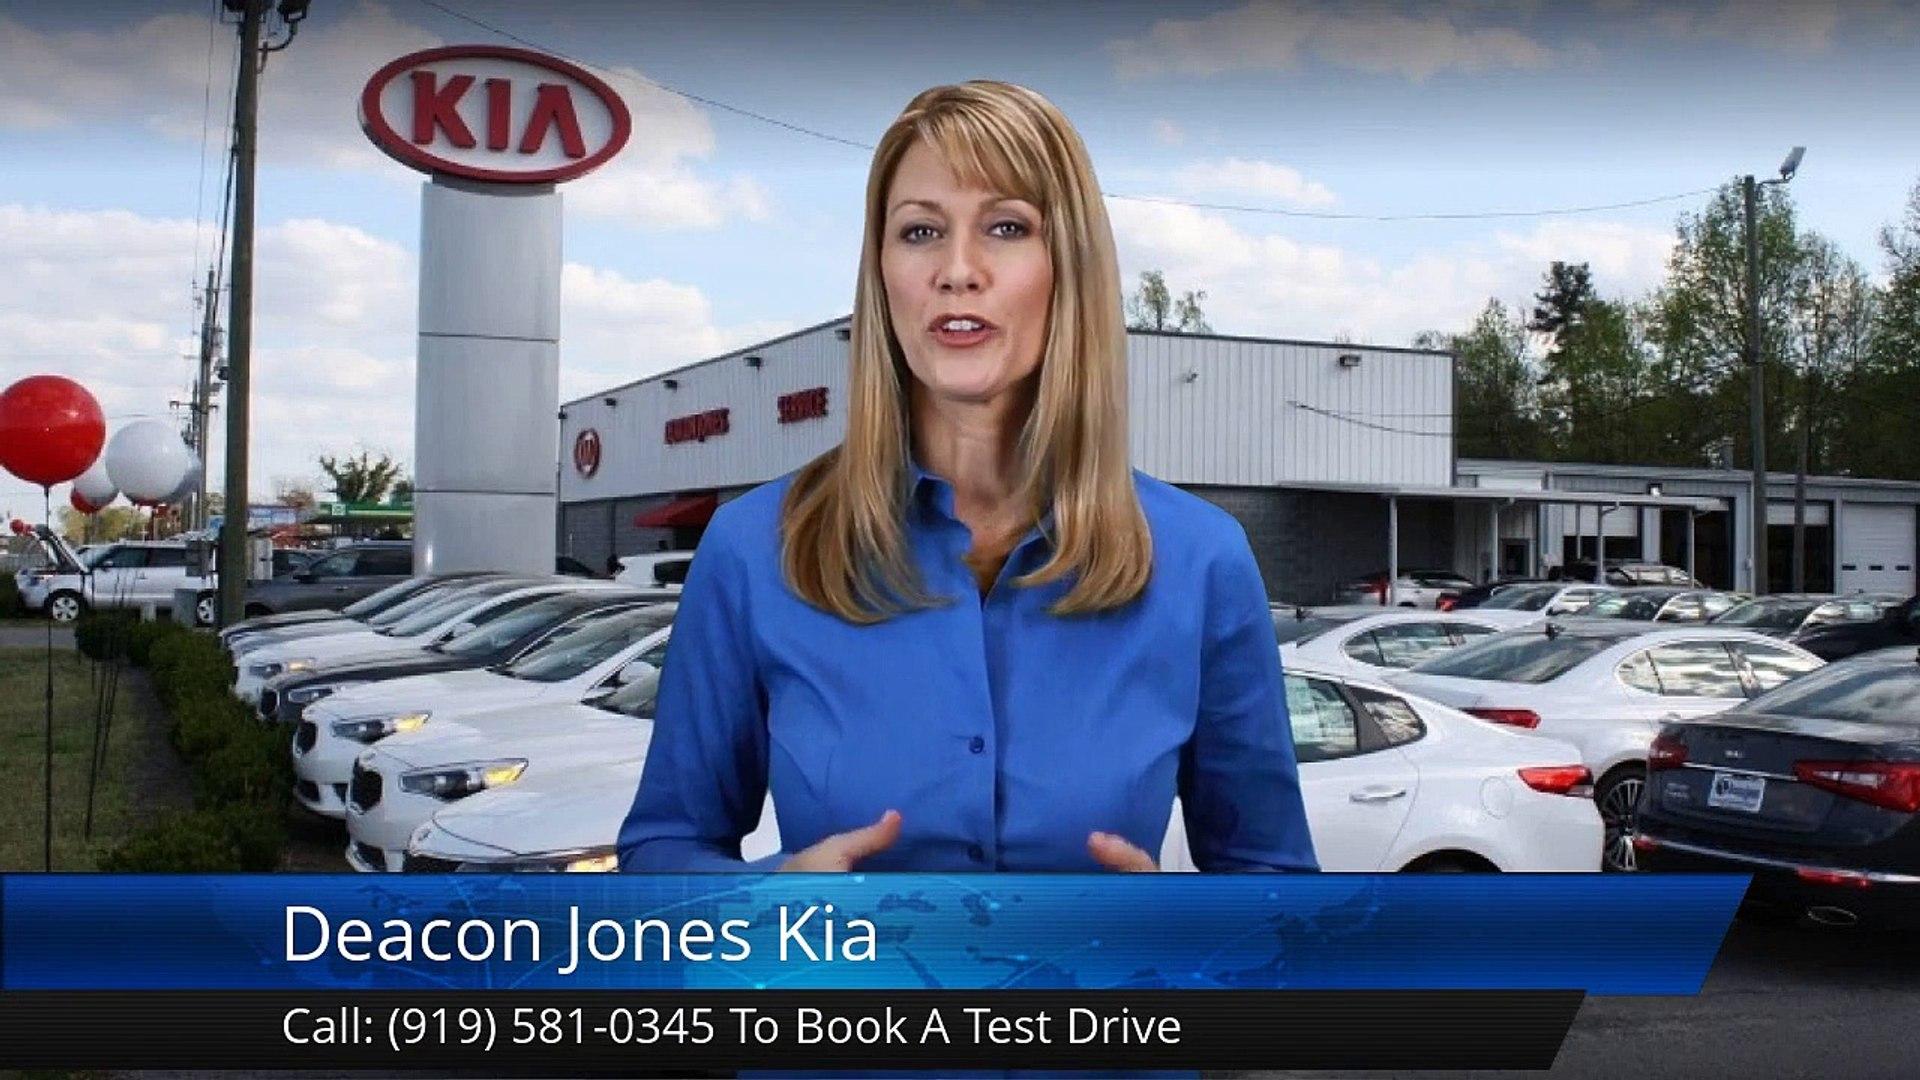 Deacon Jones Kia >> Deacon Jones Kia Goldsboronwonderfuln5 Star Review By Jay D